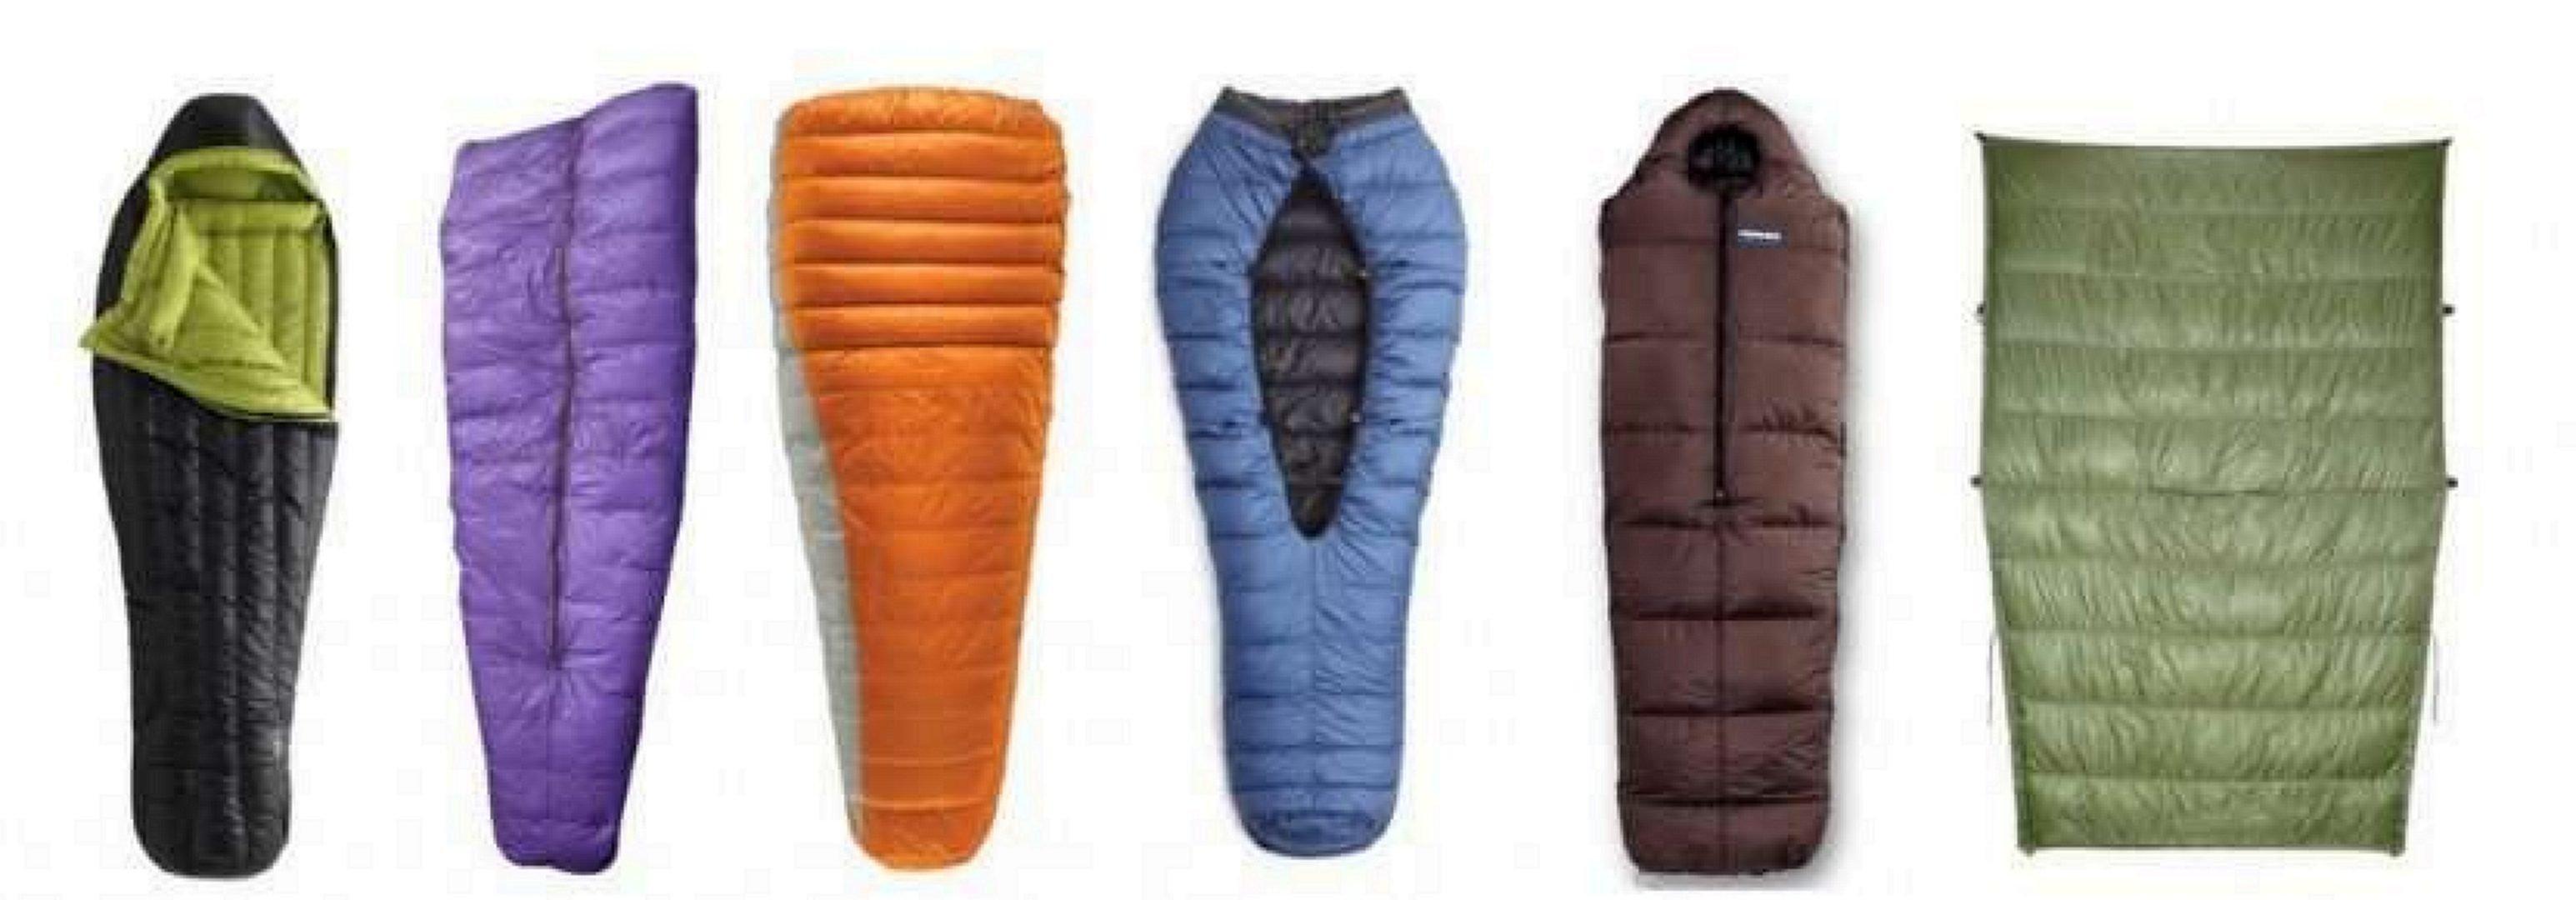 Sleeping Bag Shapes Comparison